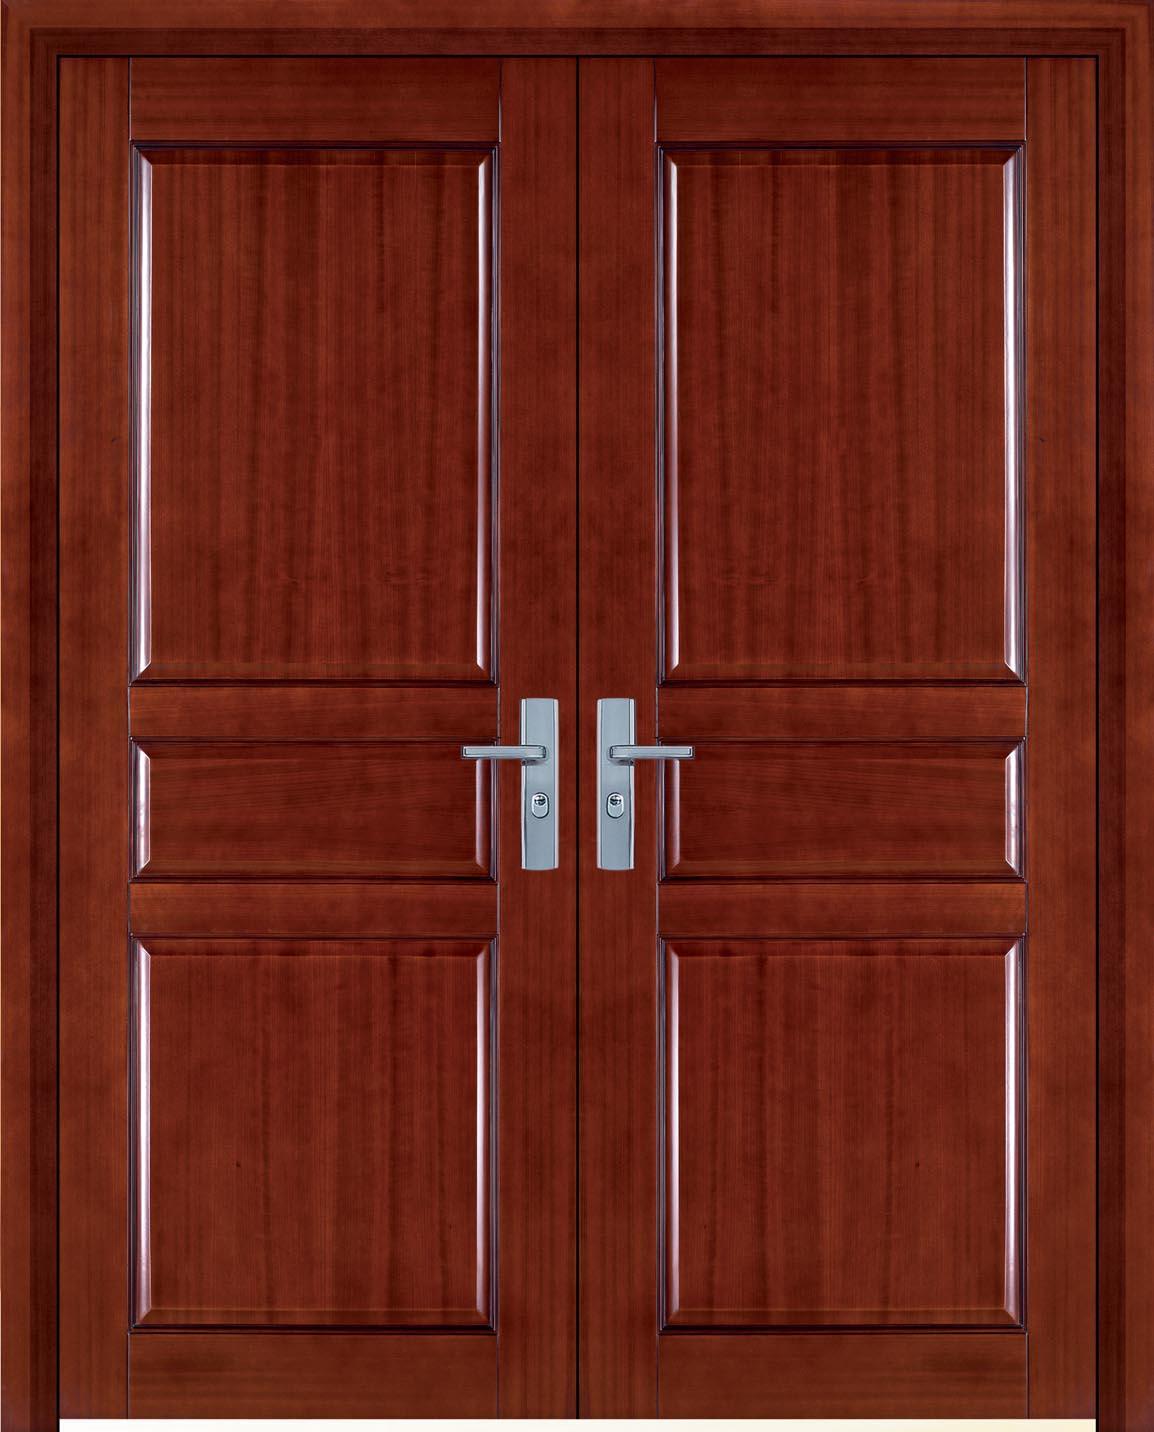 1432 #47130C Interior Doors View Interior Doors Tenglong Product Details From  save image Interior Contemporary Doors 9571154